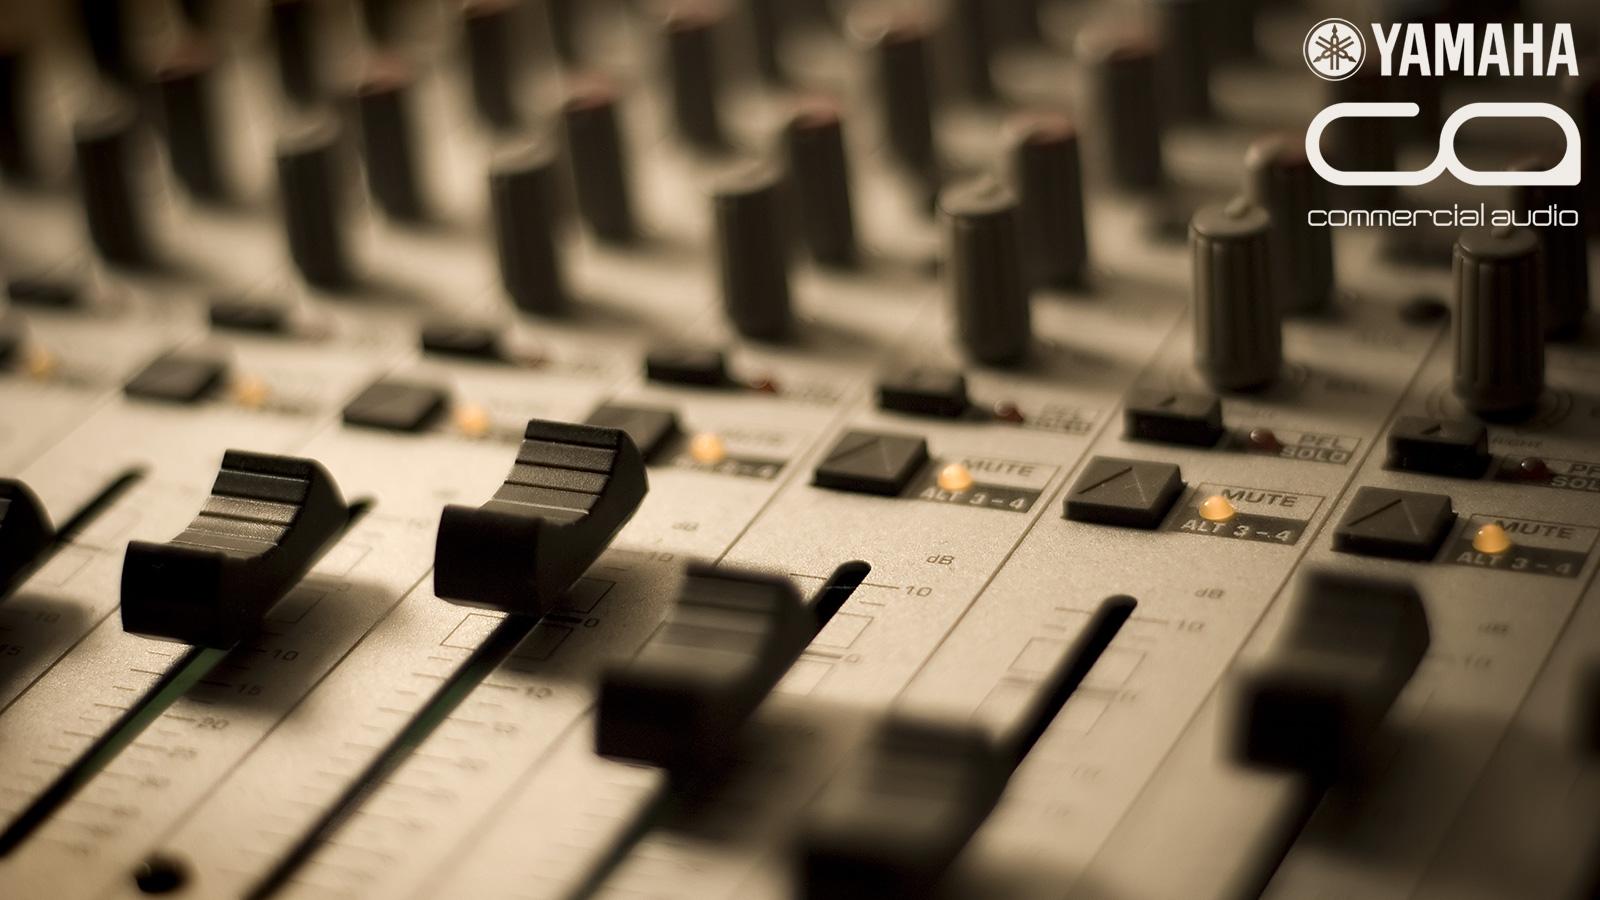 yamaha-commercial-audio1